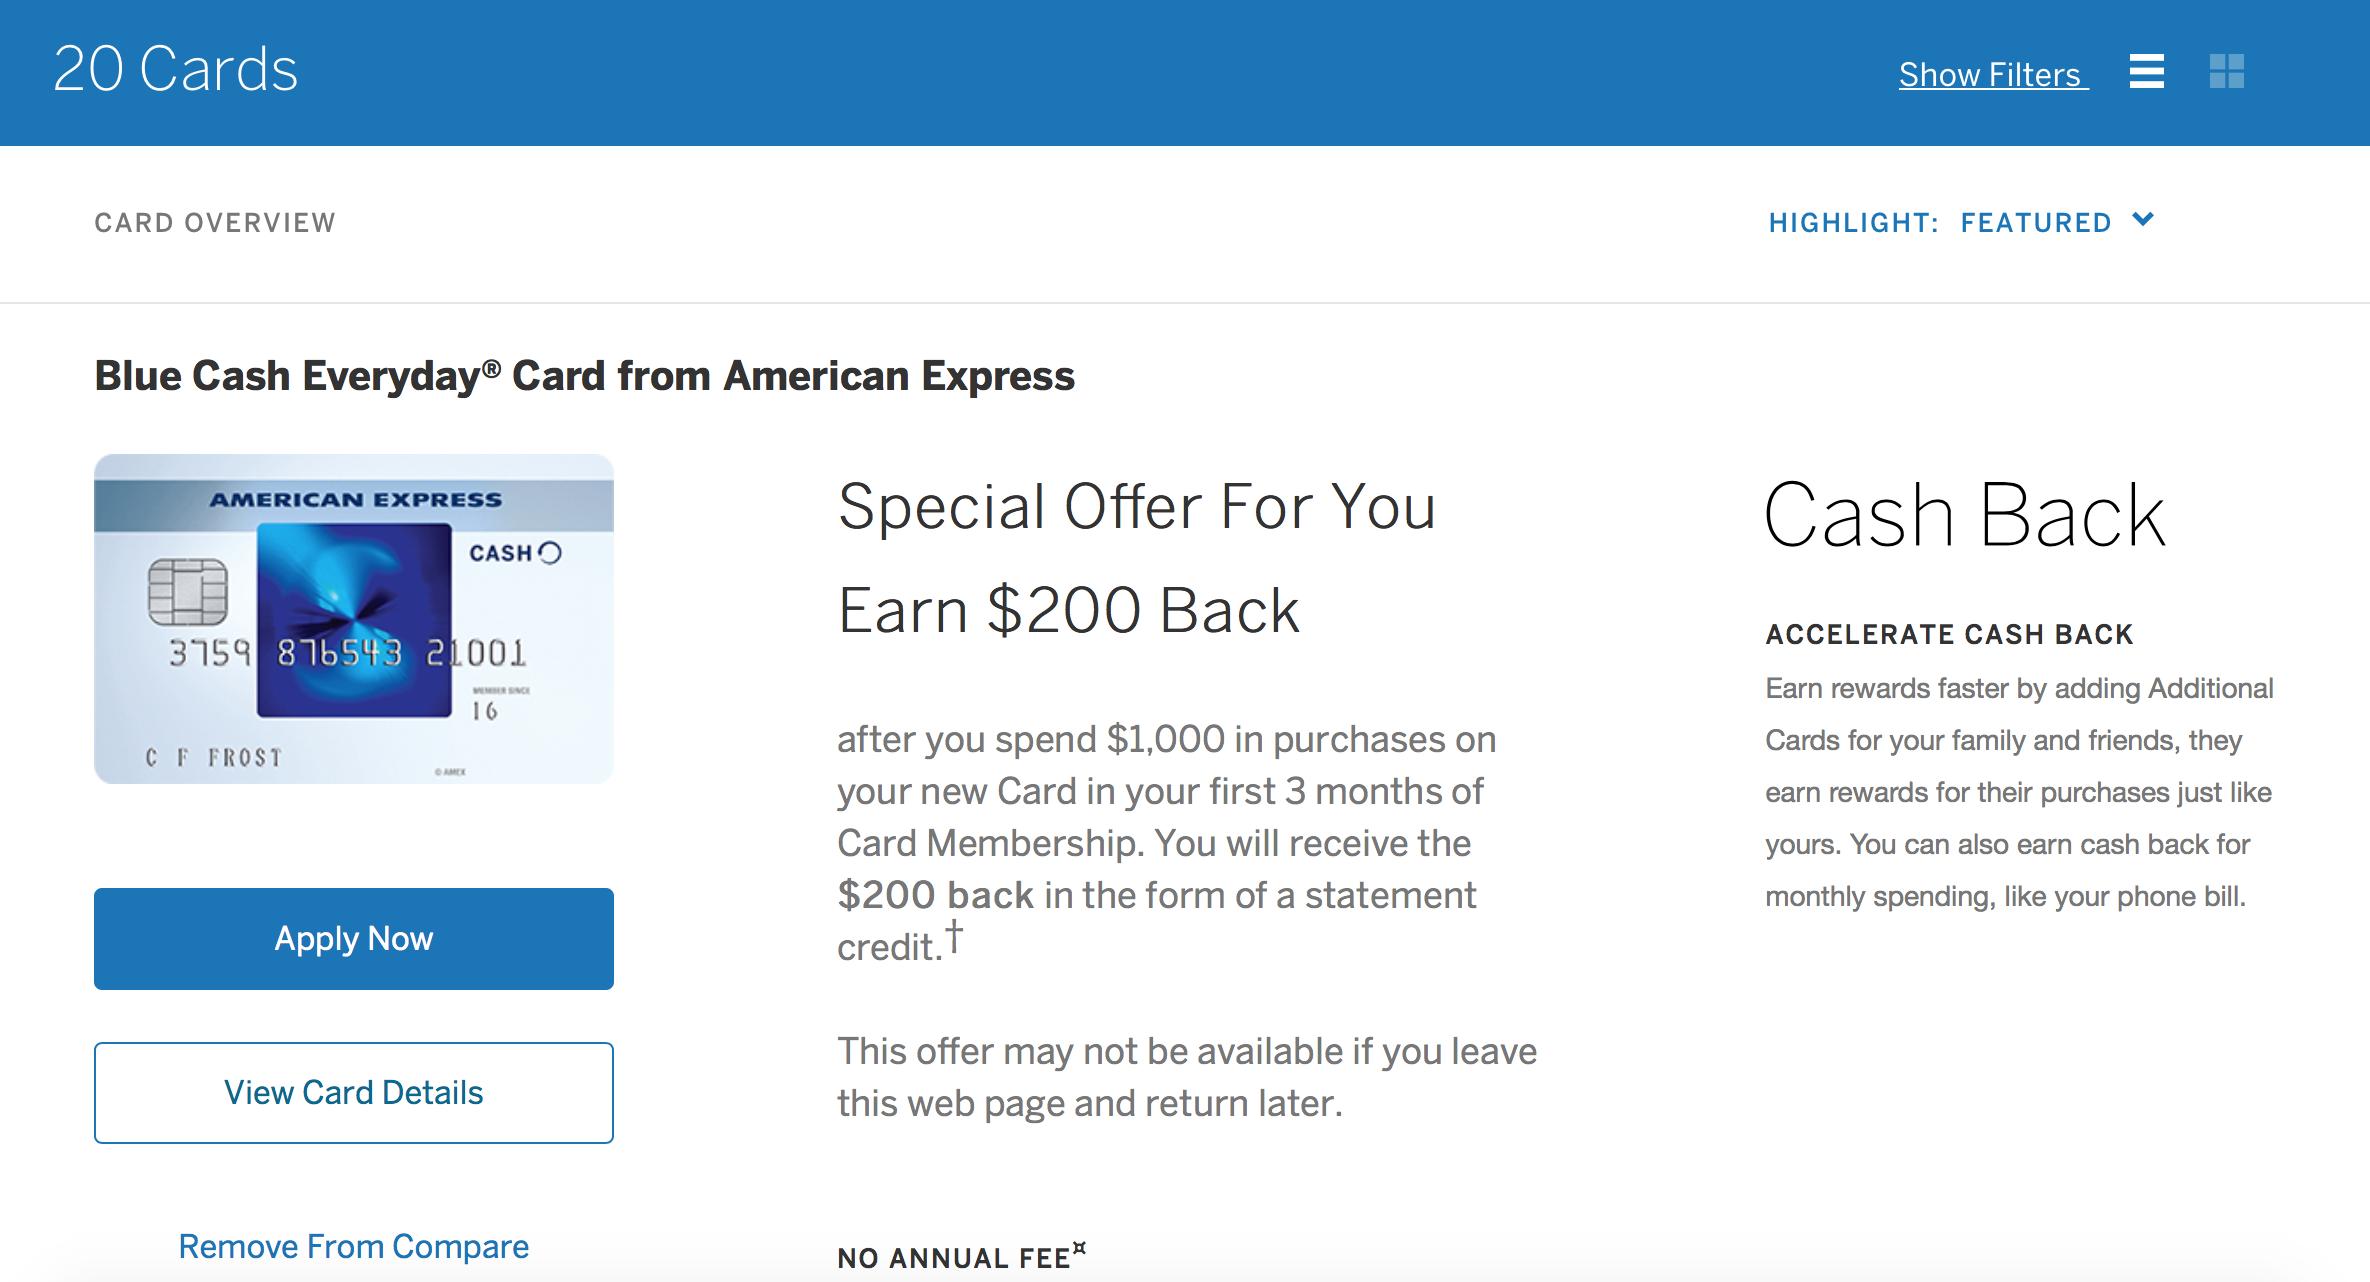 Amex Blue Cash Everyday® Card - $200 Signup Bonus [YMMV]